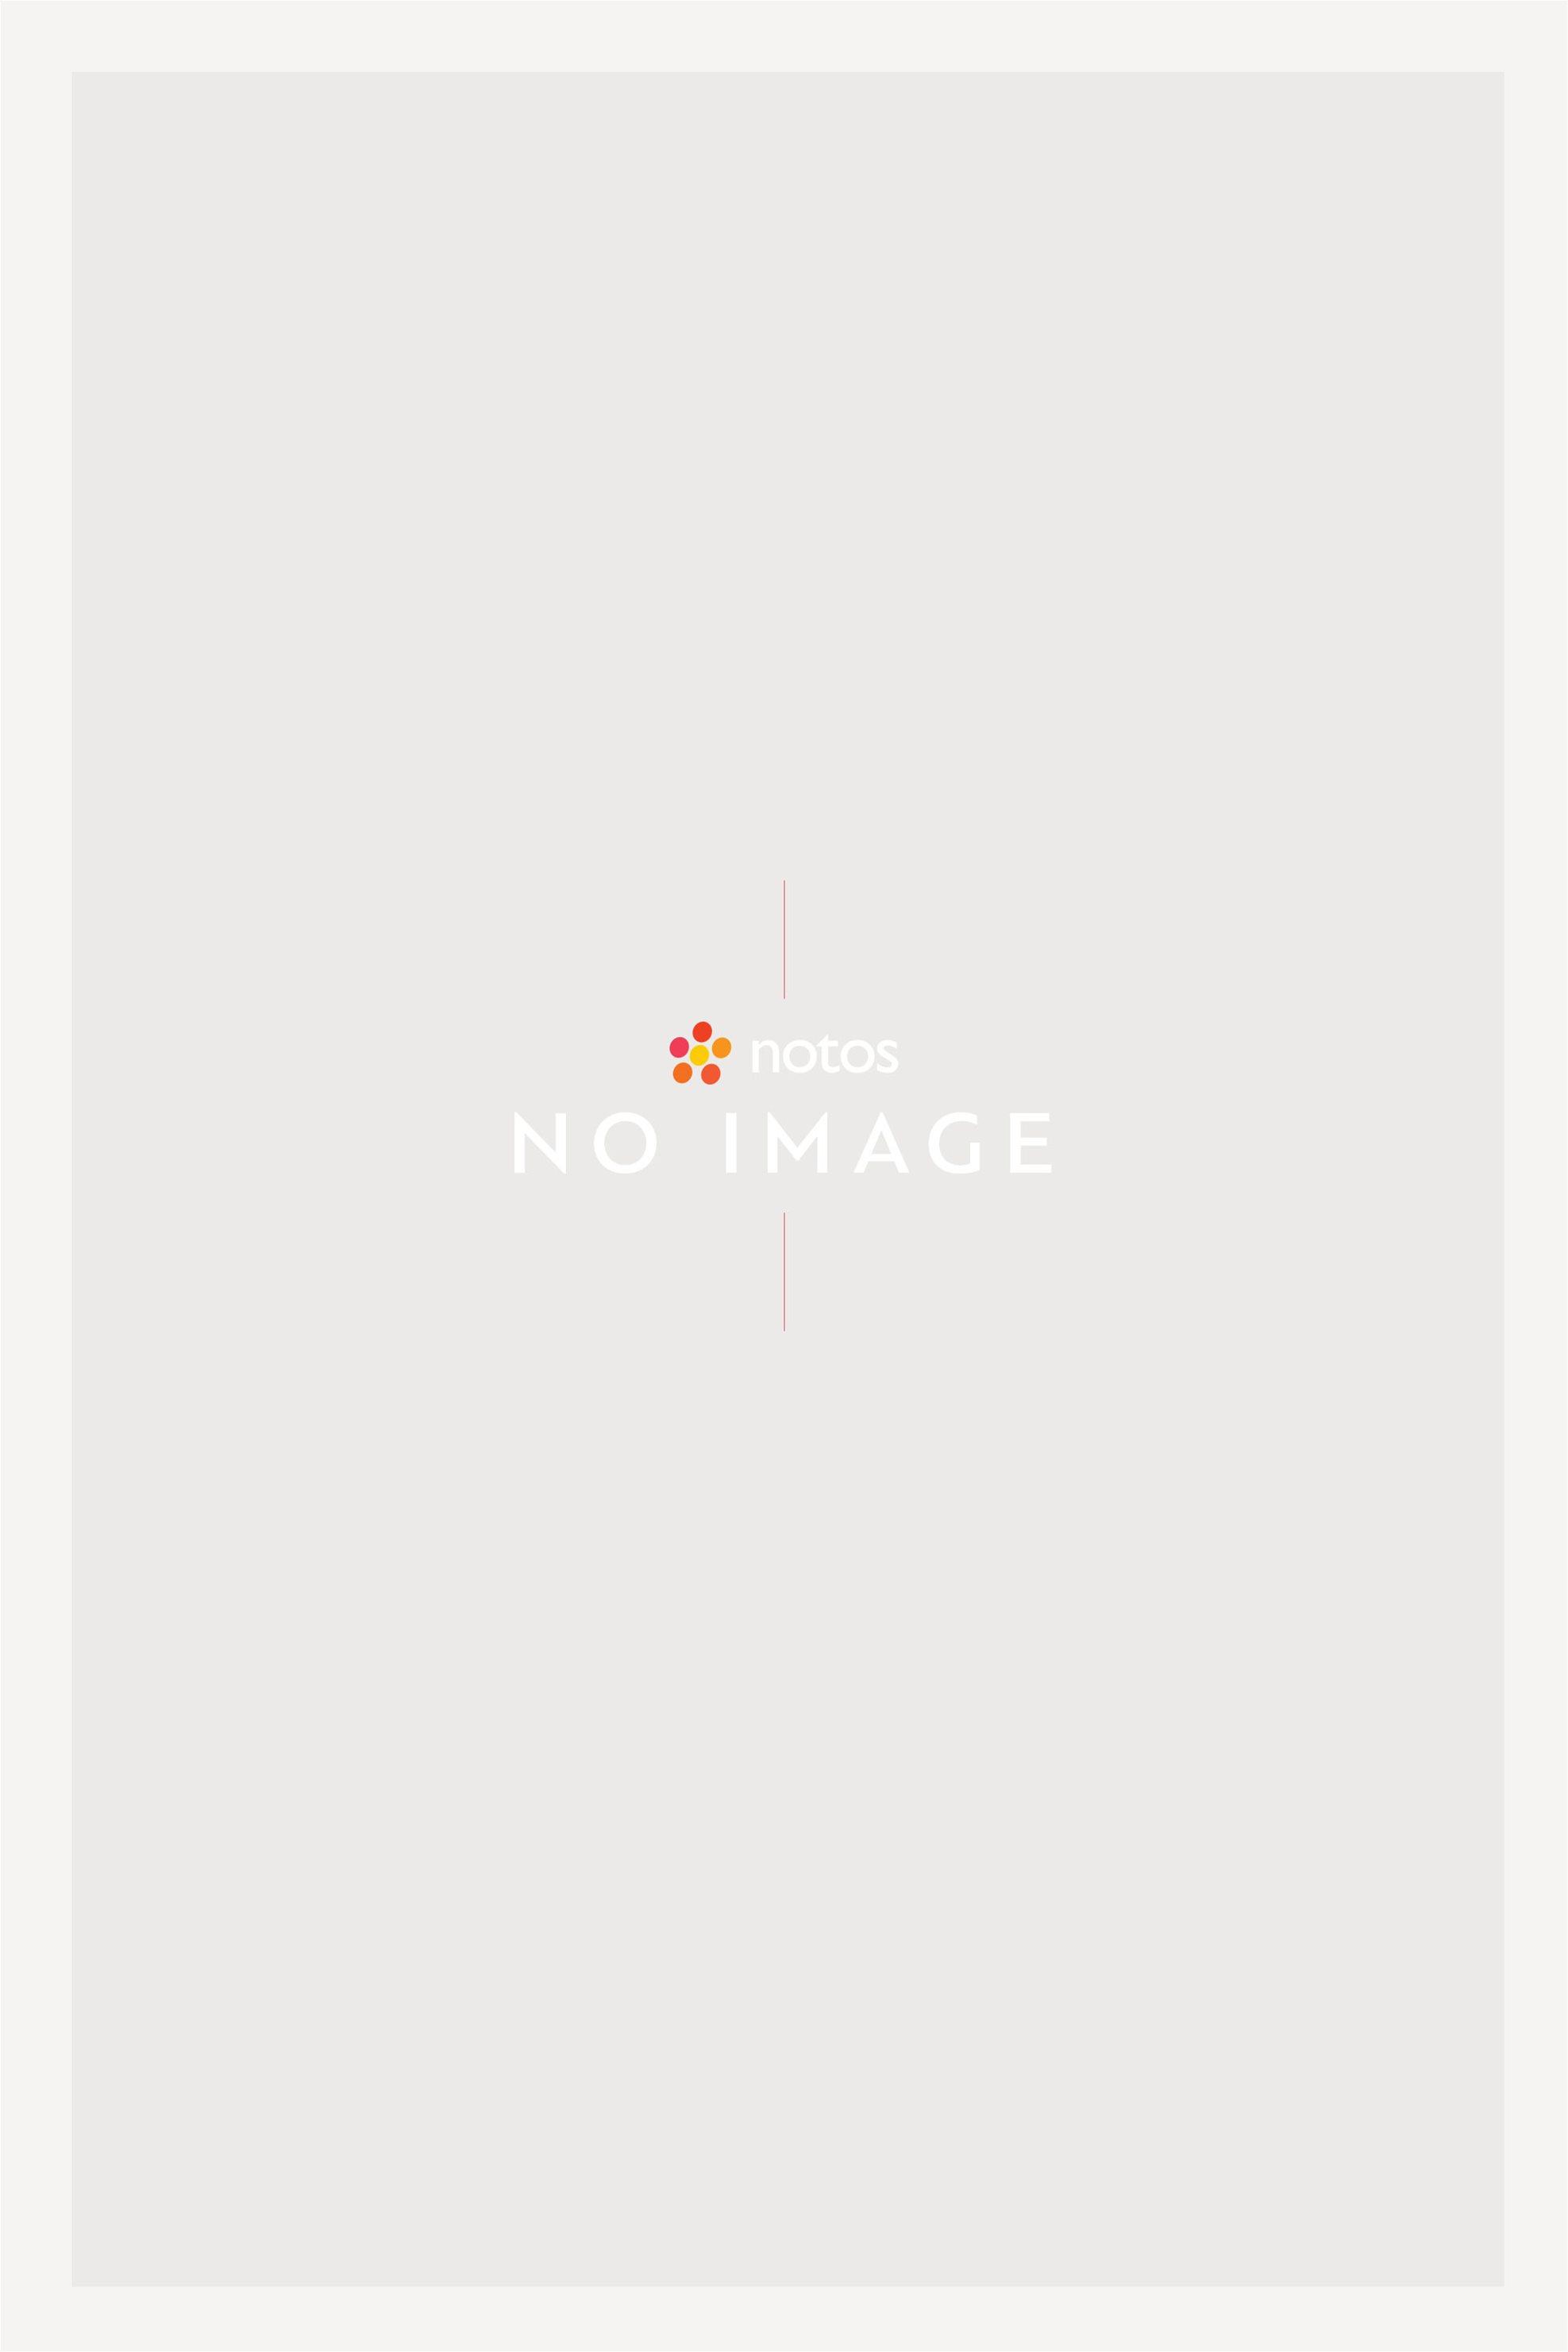 62a5e983bc30 Lacoste ανδρική μπλούζα Polo L.12.12 με μακρύ μανίκι - L1312 - Καφέ